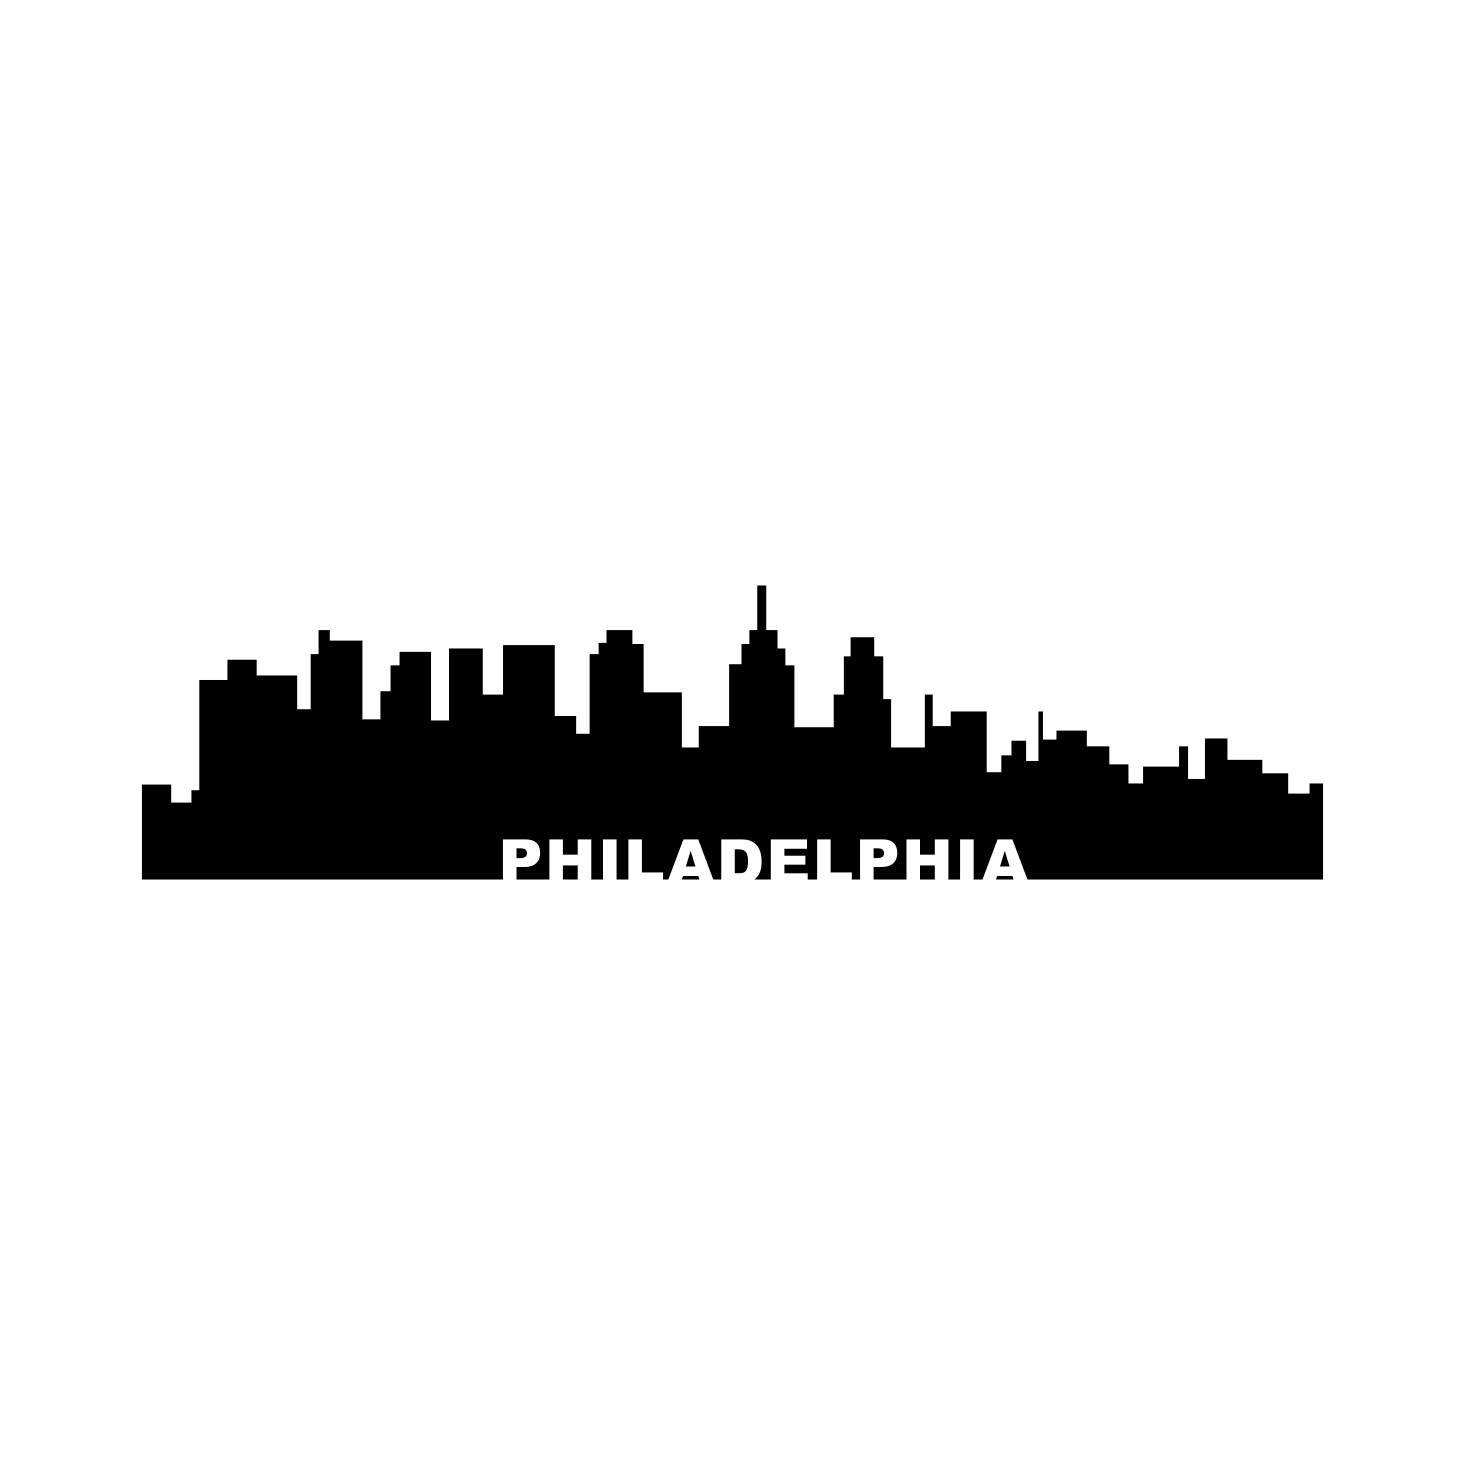 Philadelphia City Skyline Town Graphics Svg Dxf Eps Png Cdr Ai Pdf Vector Art Clipart Instant Download Digital Cu City Skyline Philadelphia Skyline Art Clipart